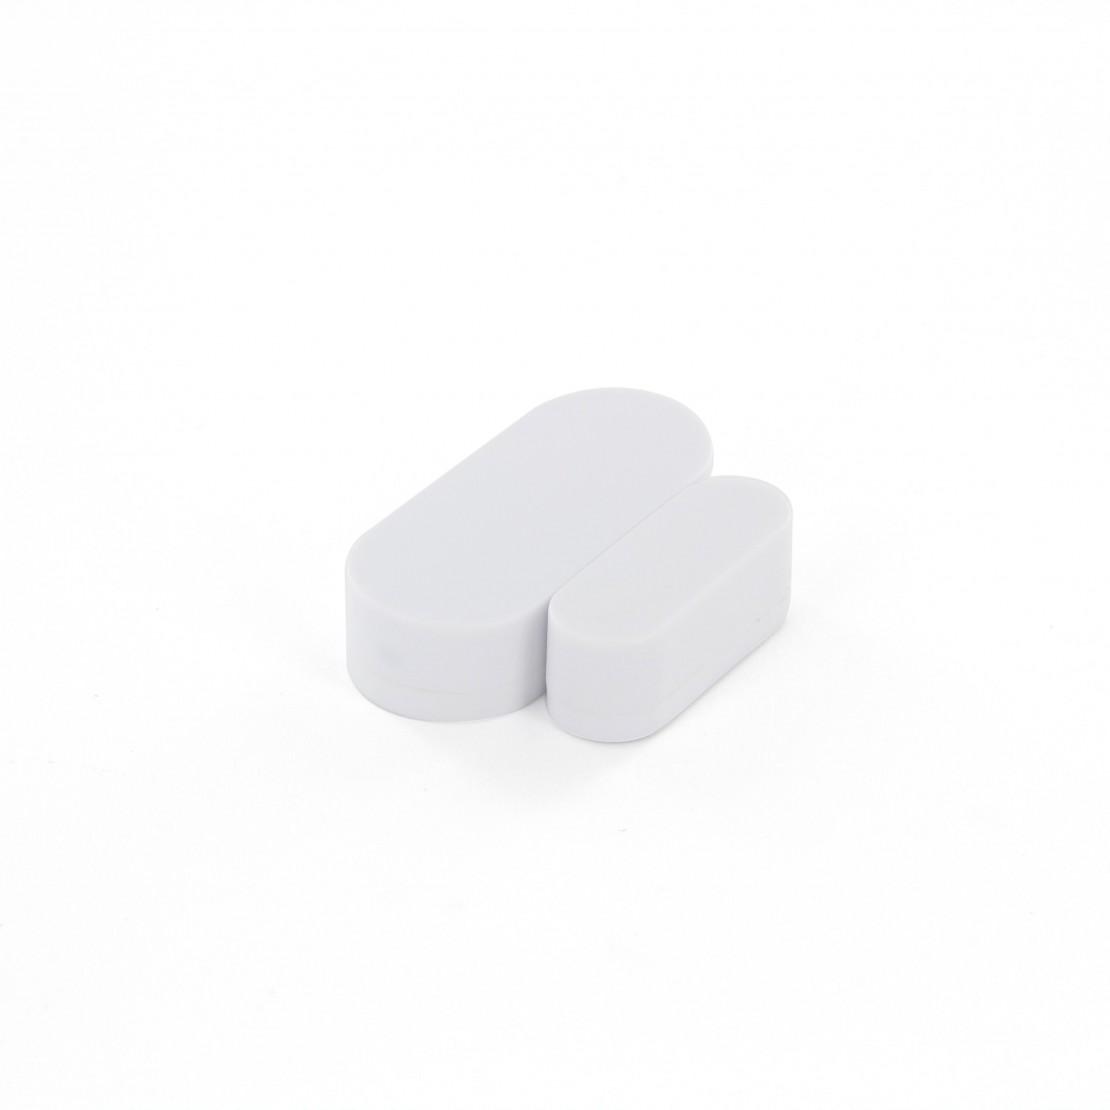 Mini sensor de aberturade porta ou janela - DiO 1.0